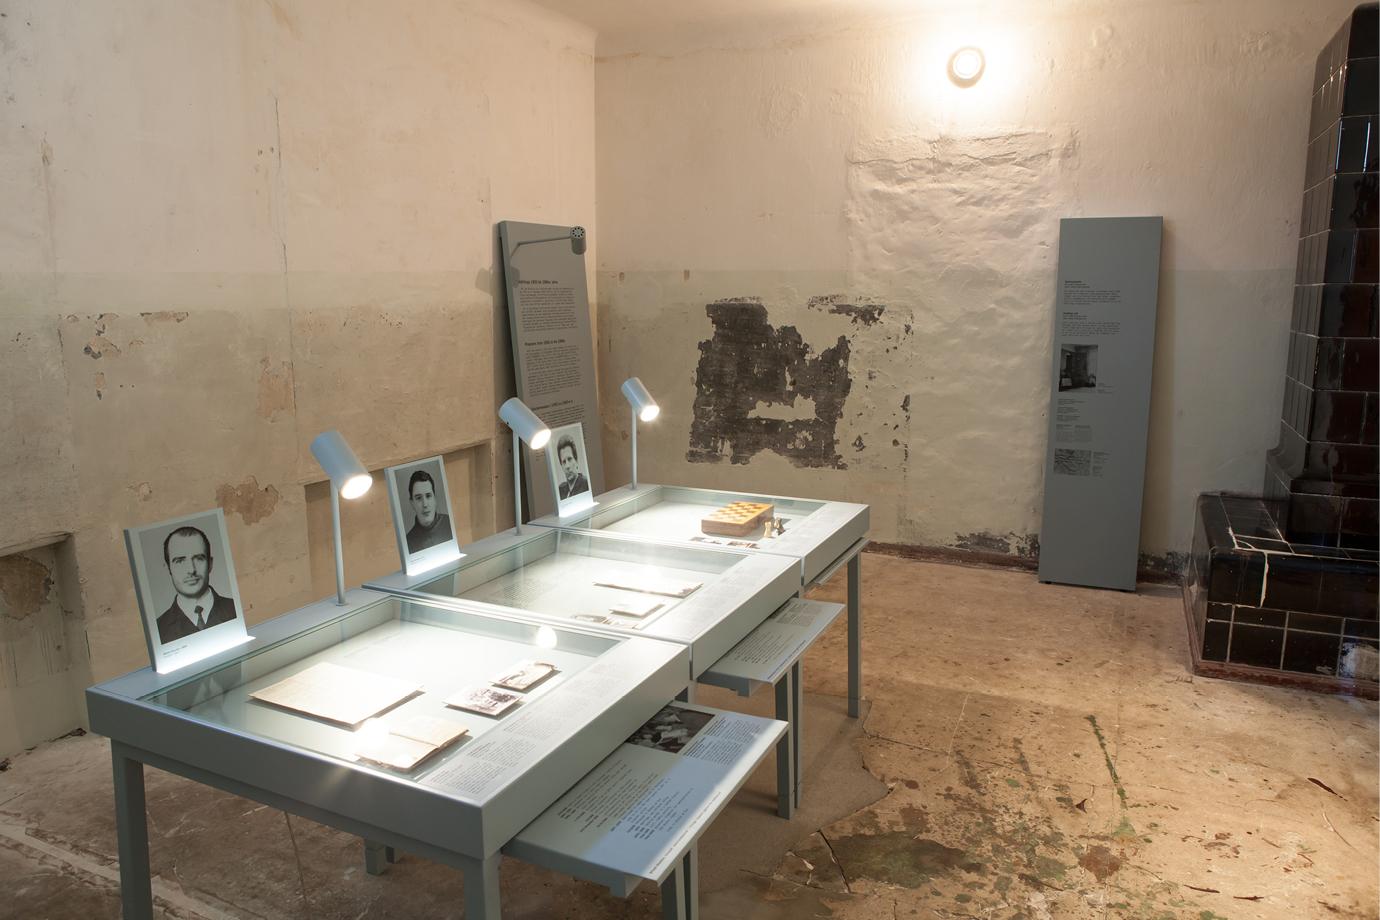 http://e-o-t.de/wordpress/wp-content/uploads/2017/04/2012_eot-Leistikow-Exhibition-NEU.jpg